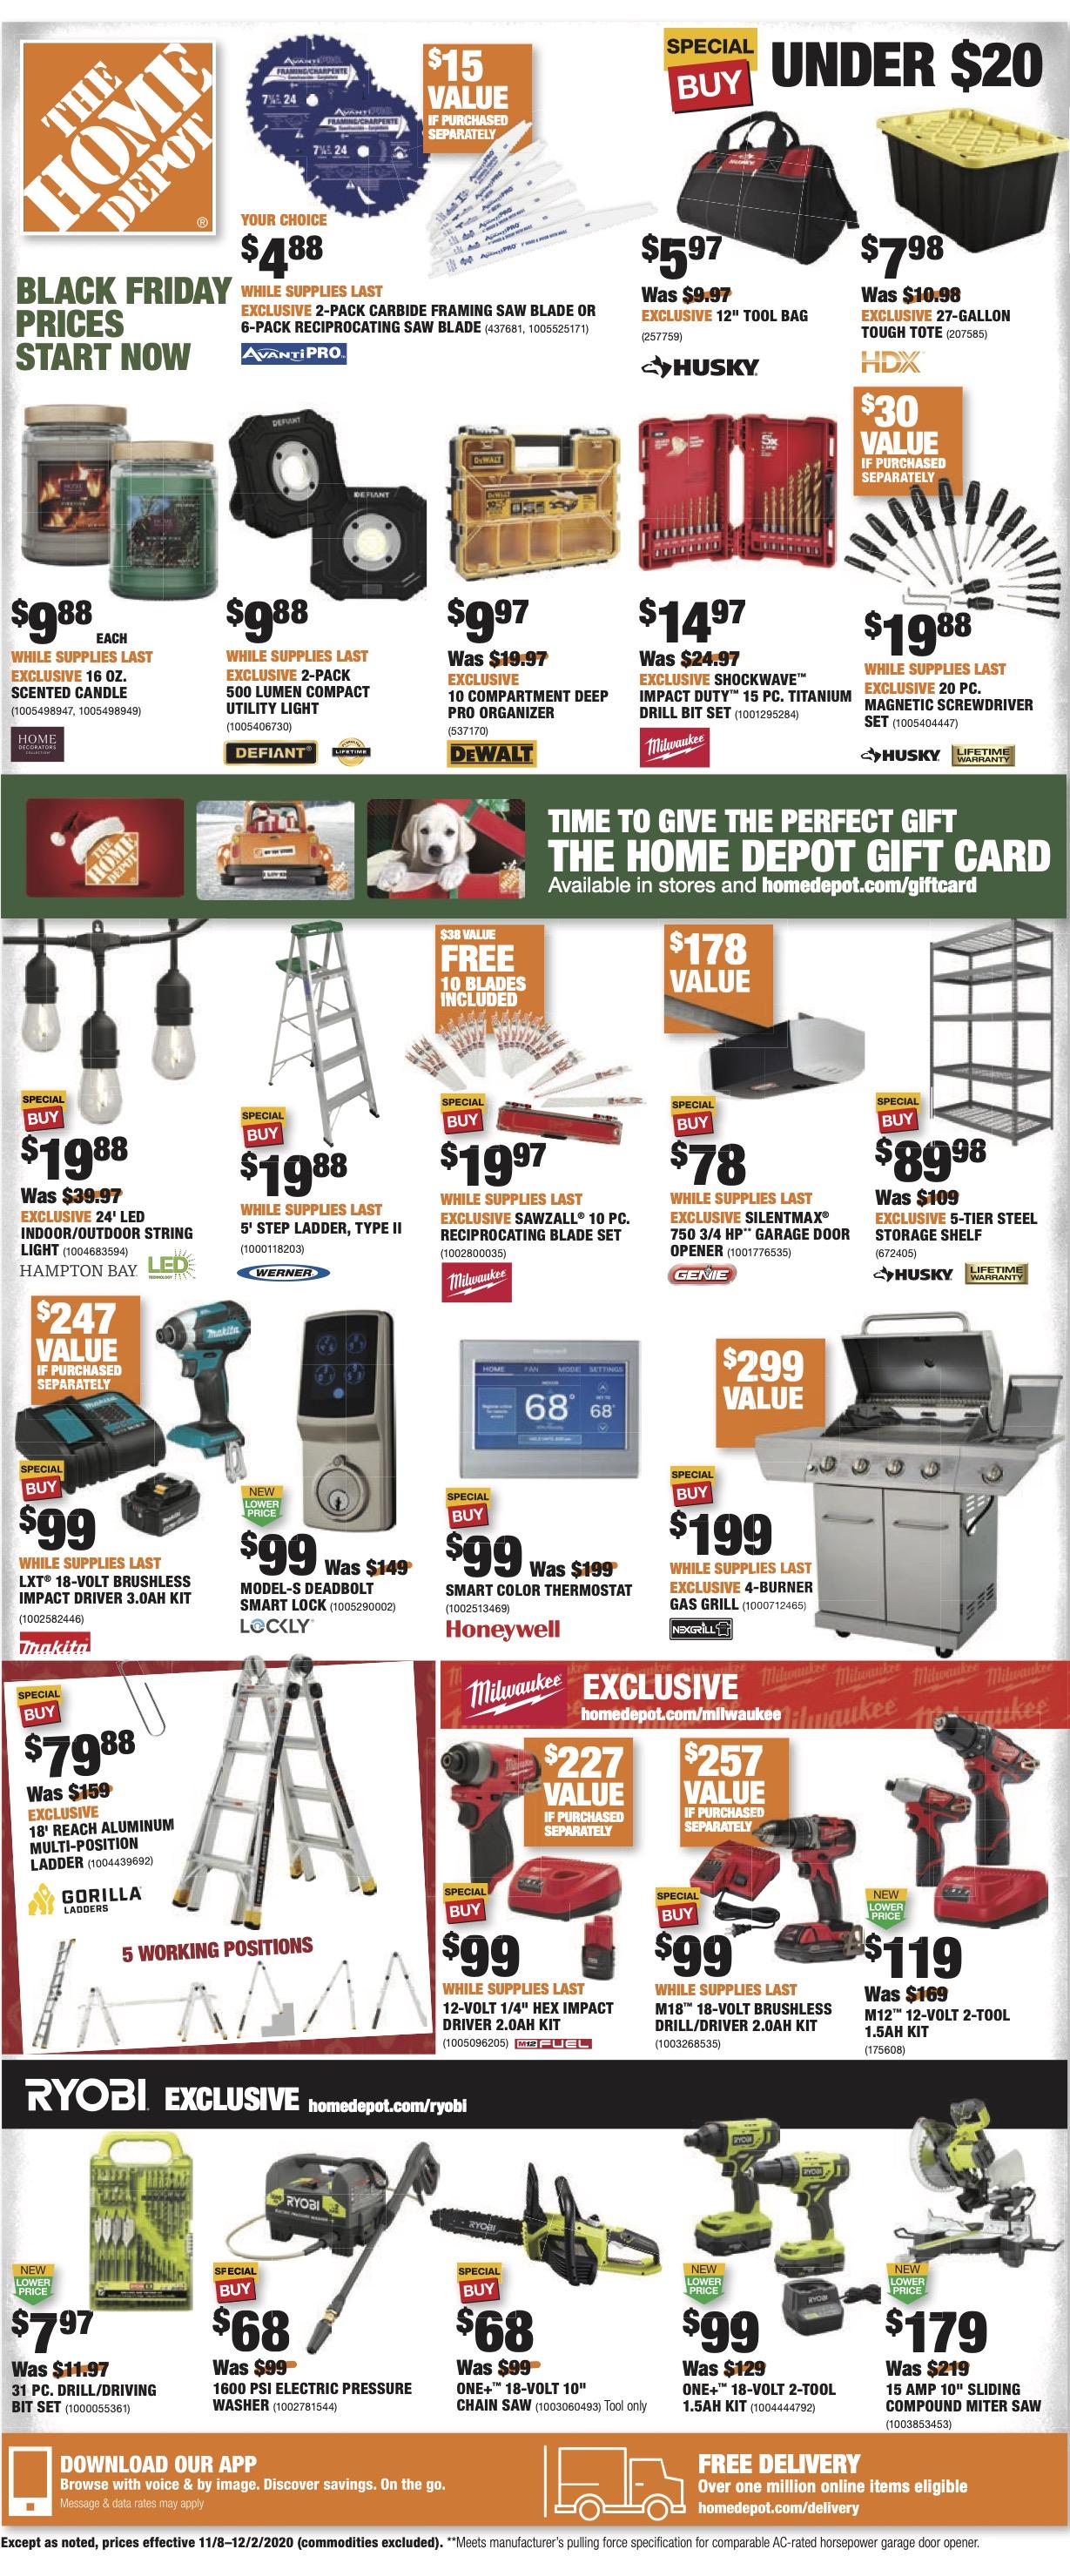 Home Depot Black Friday Improved Starts November 6 9to5toys